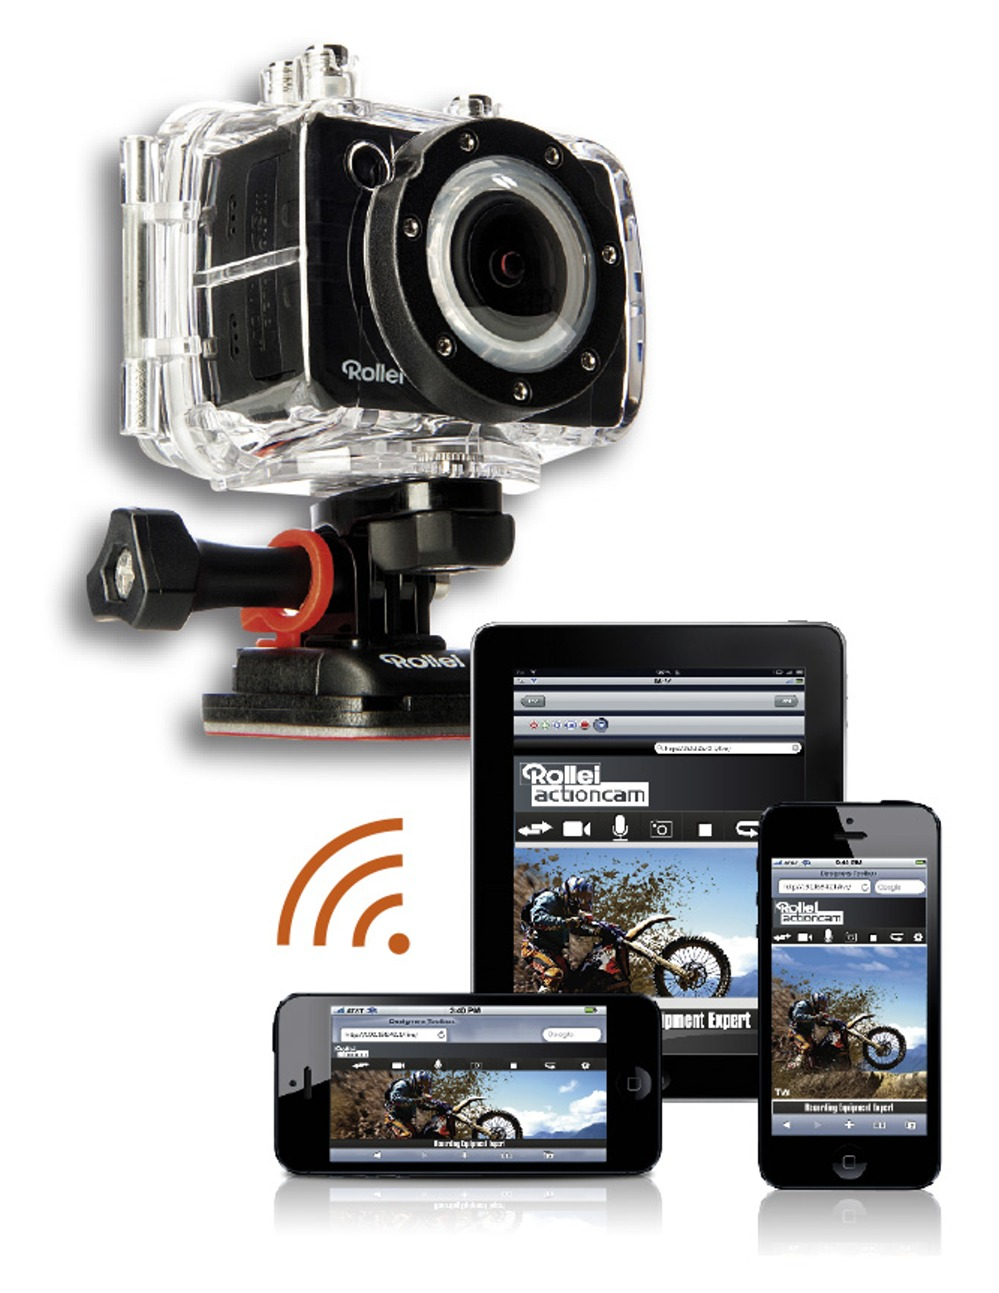 rollei actioncam 5s wifi in zwei wahnsinns editionen. Black Bedroom Furniture Sets. Home Design Ideas